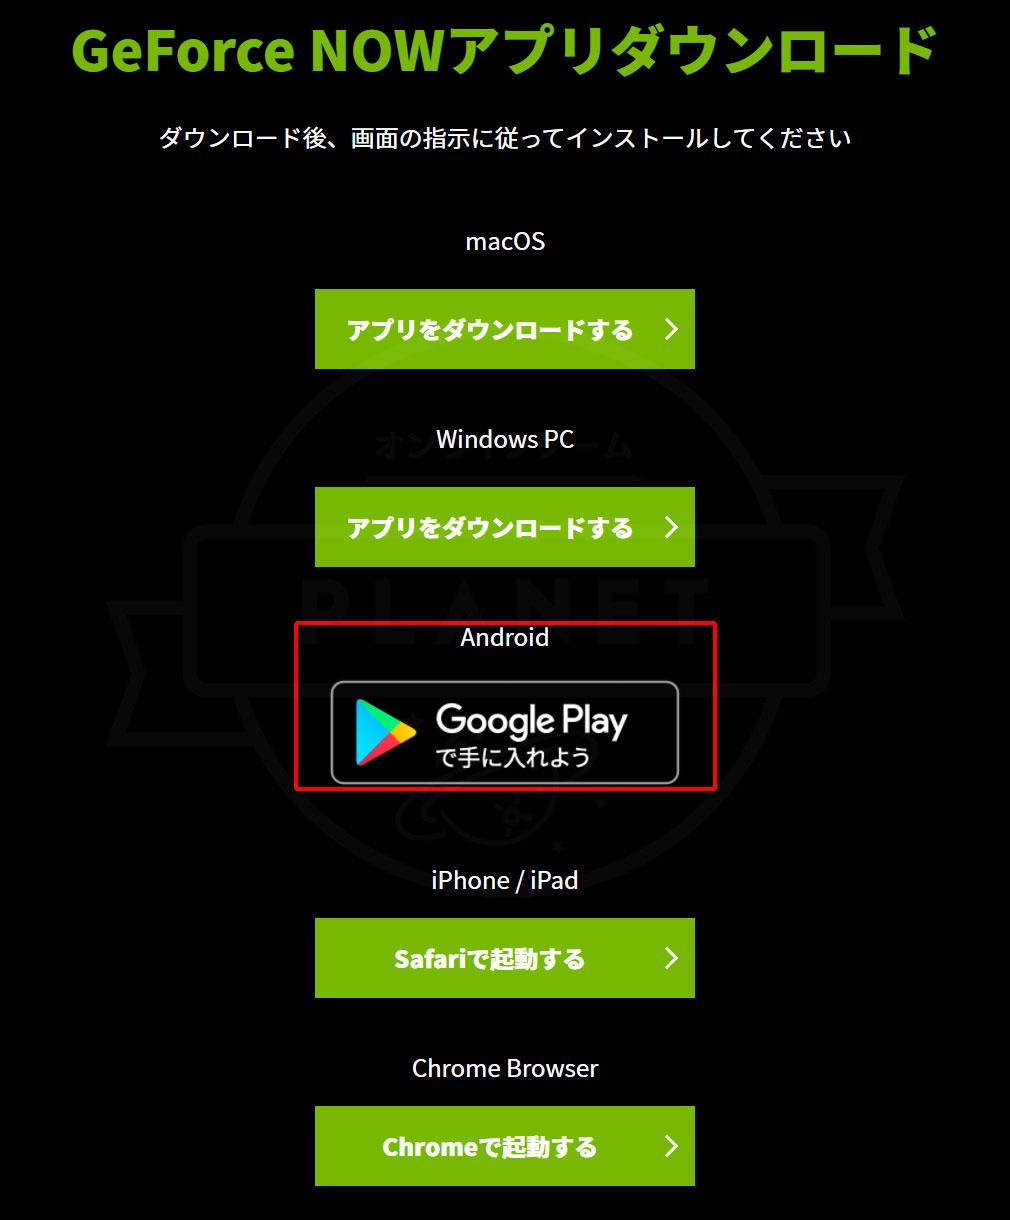 GeForce NOW Powered by SoftBank Android版『ダウンロードした画面』スクリーンショット